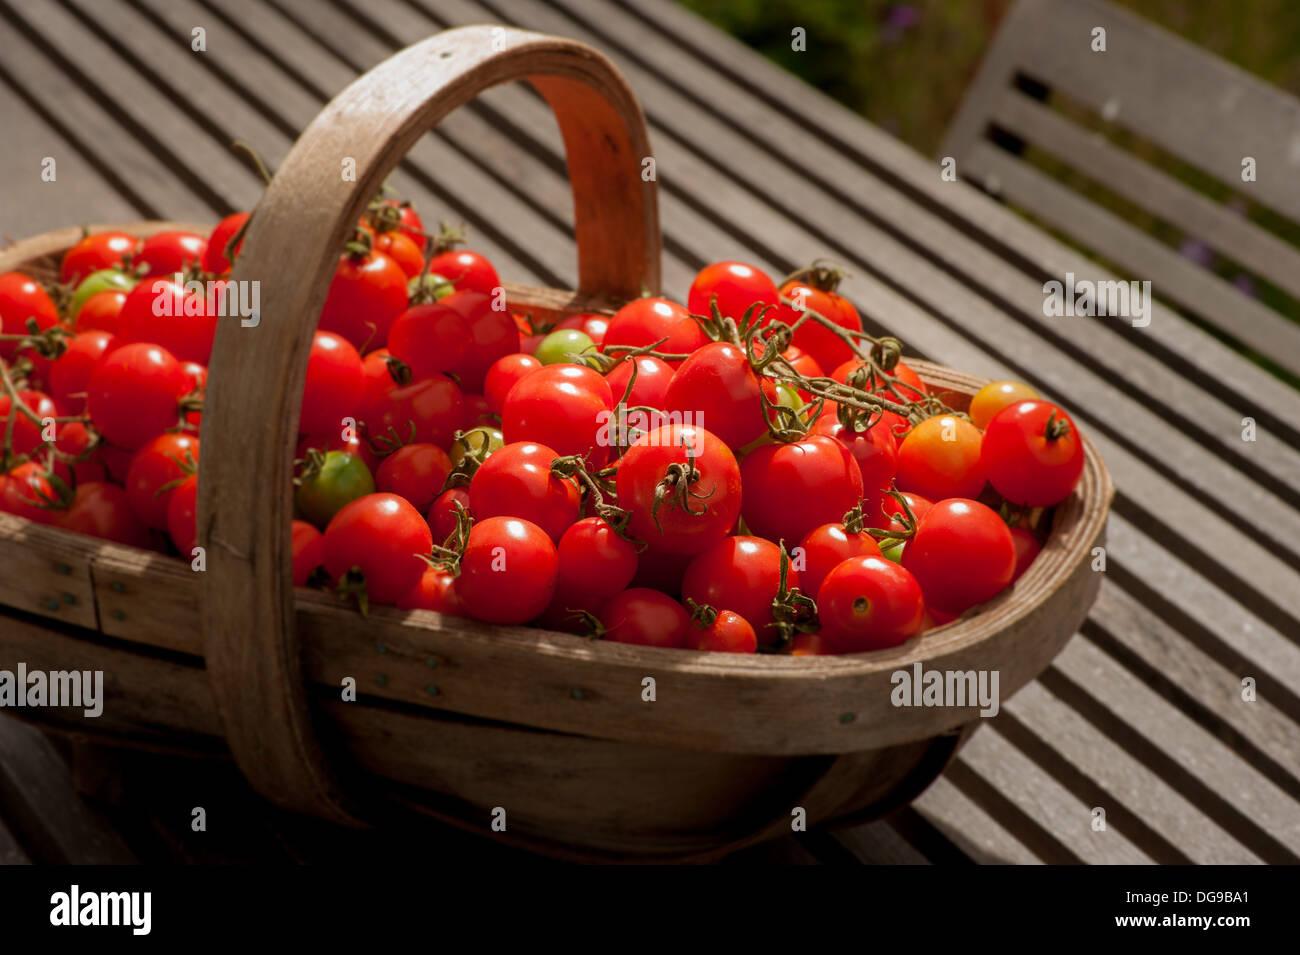 End of season tomato harvest in wooden trug on garden table. - Stock Image